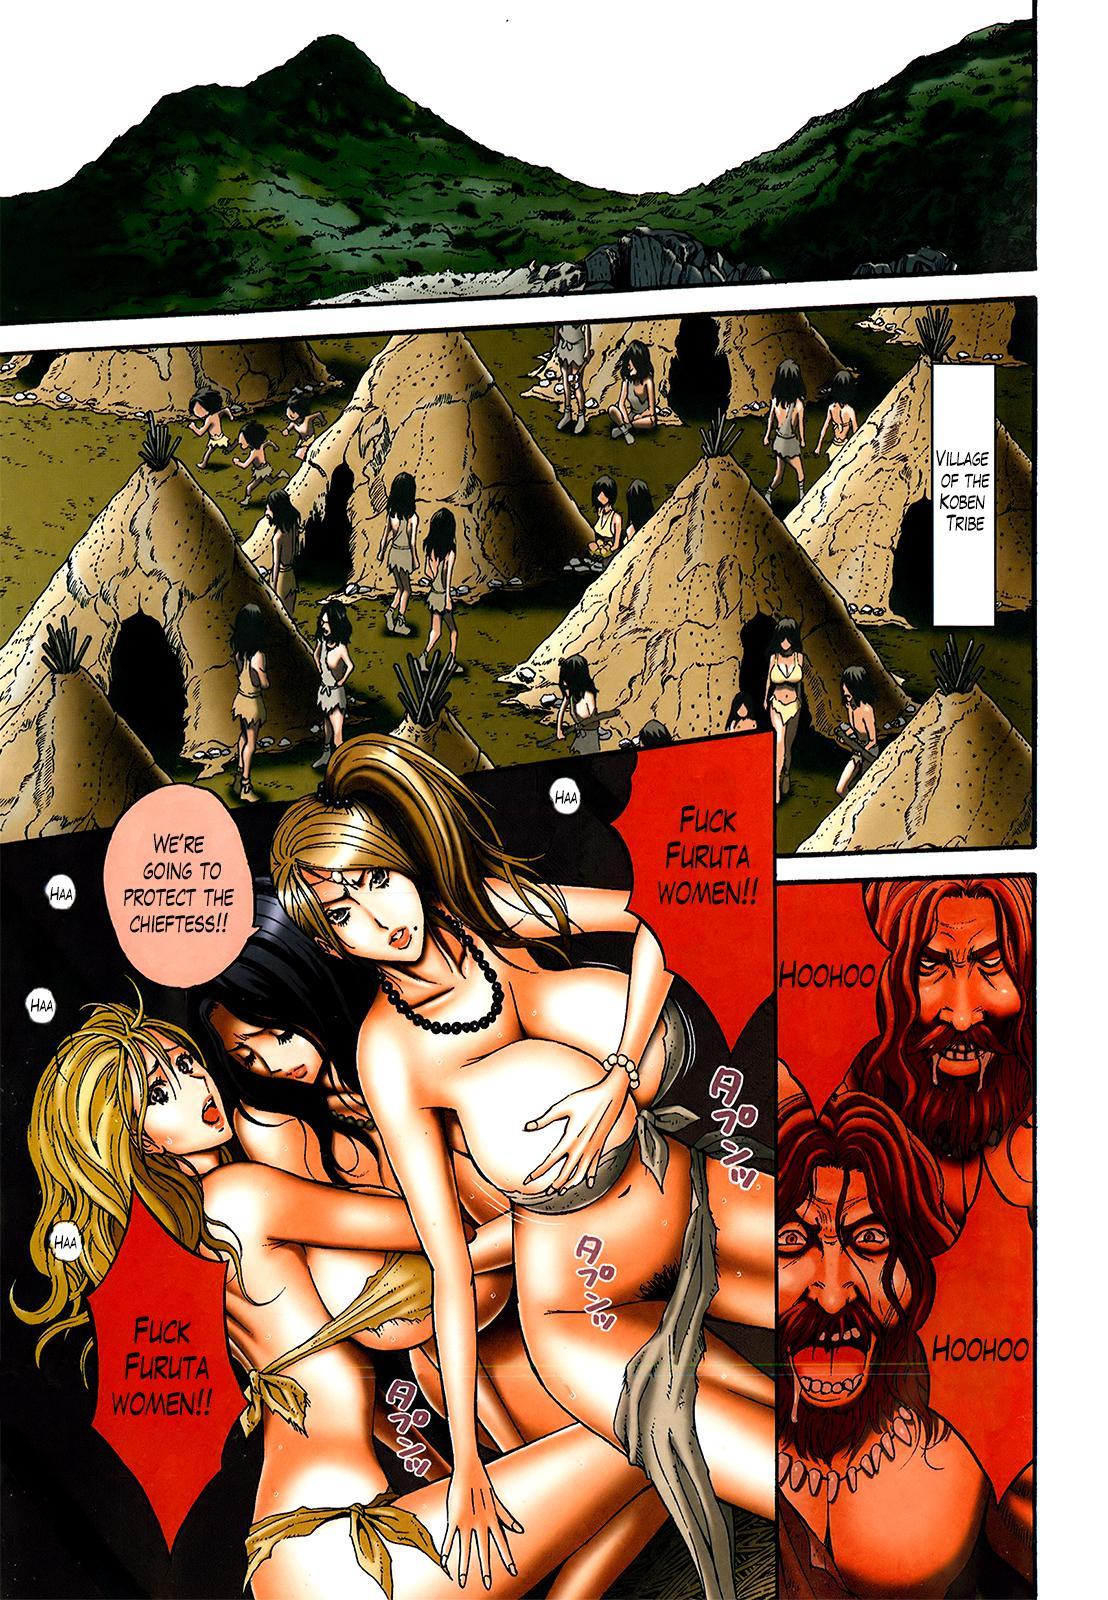 Kigenzen 10000 Nen no Ota | The Otaku in 10,000 B.C. 175